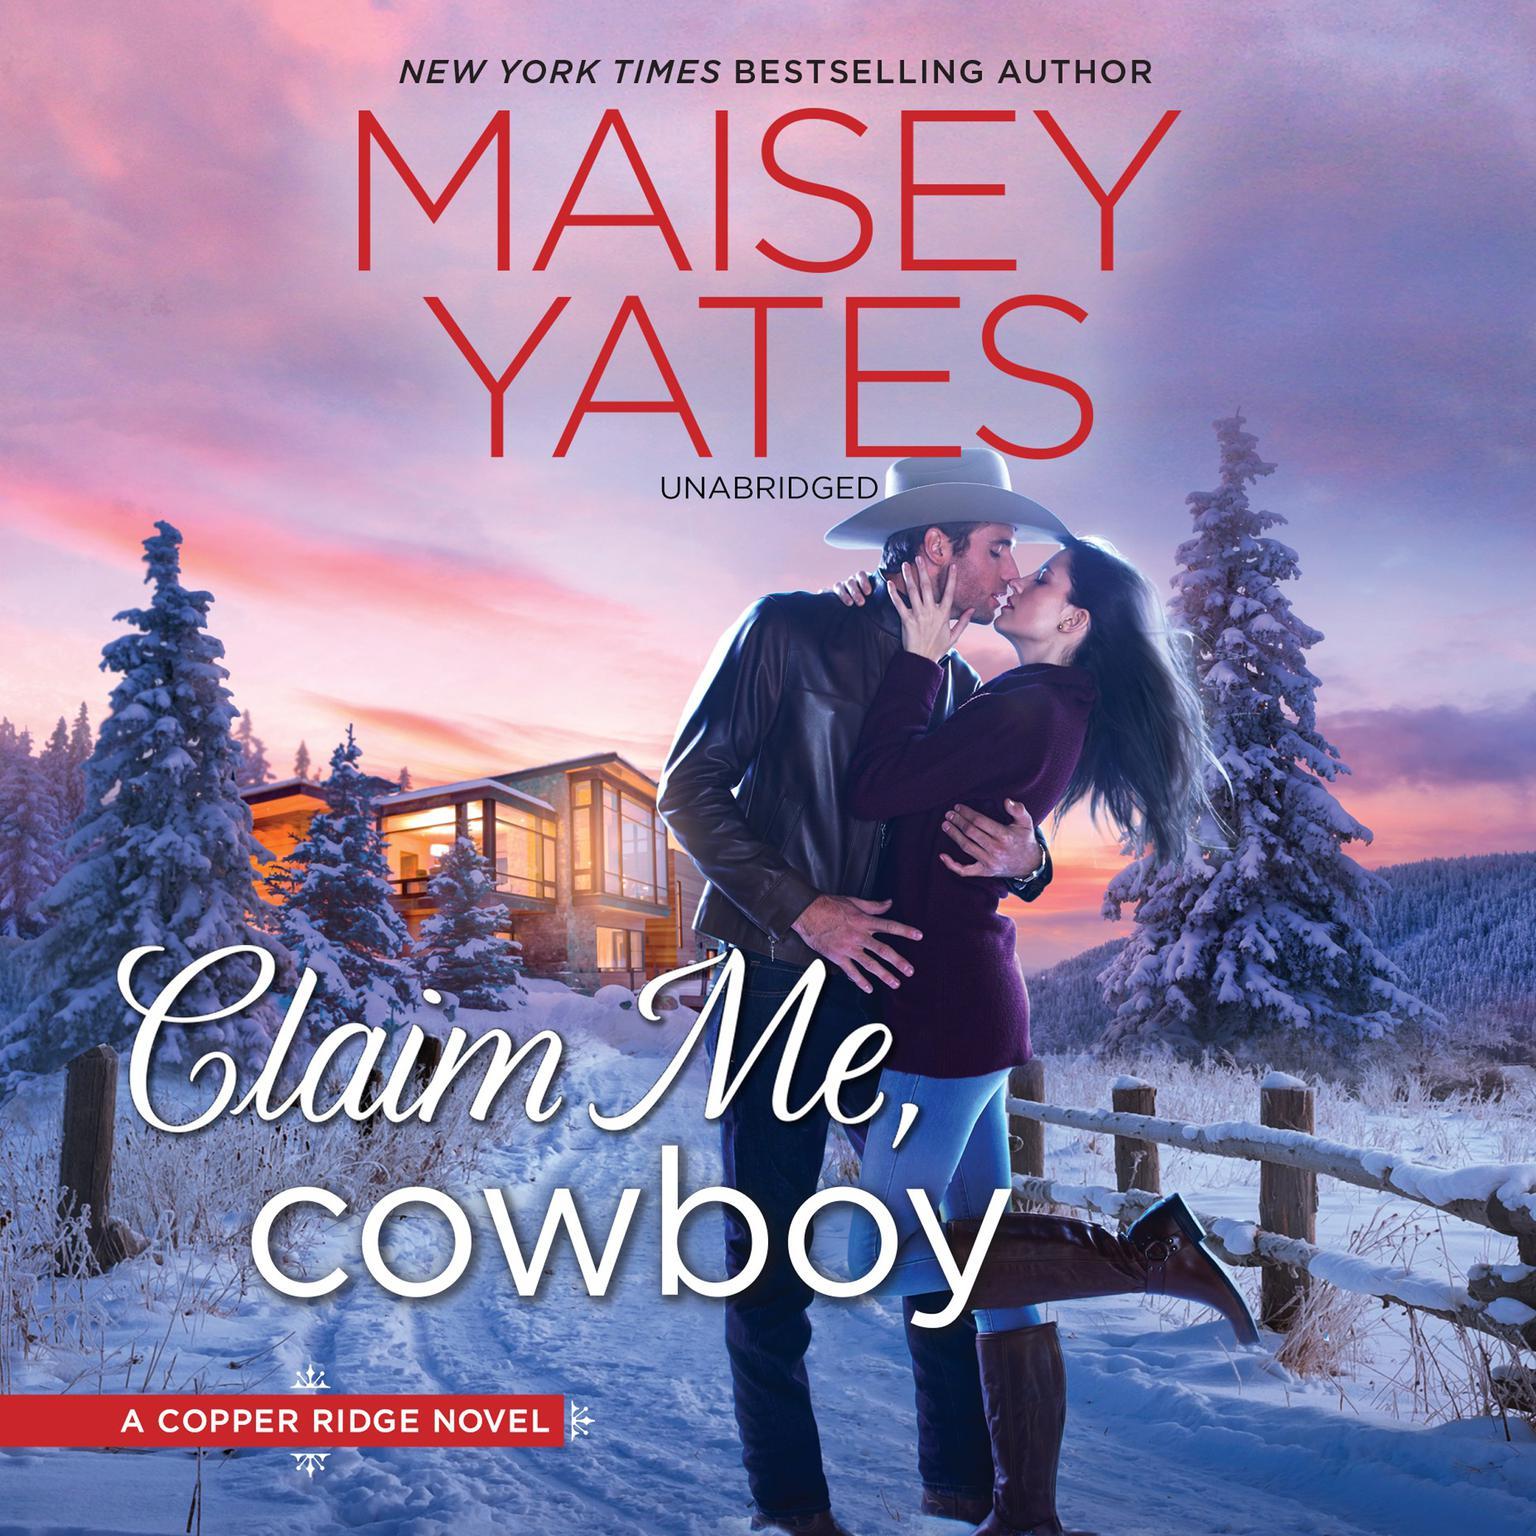 Claim Me, Cowboy: Copper Ridge Audiobook, by Maisey Yates